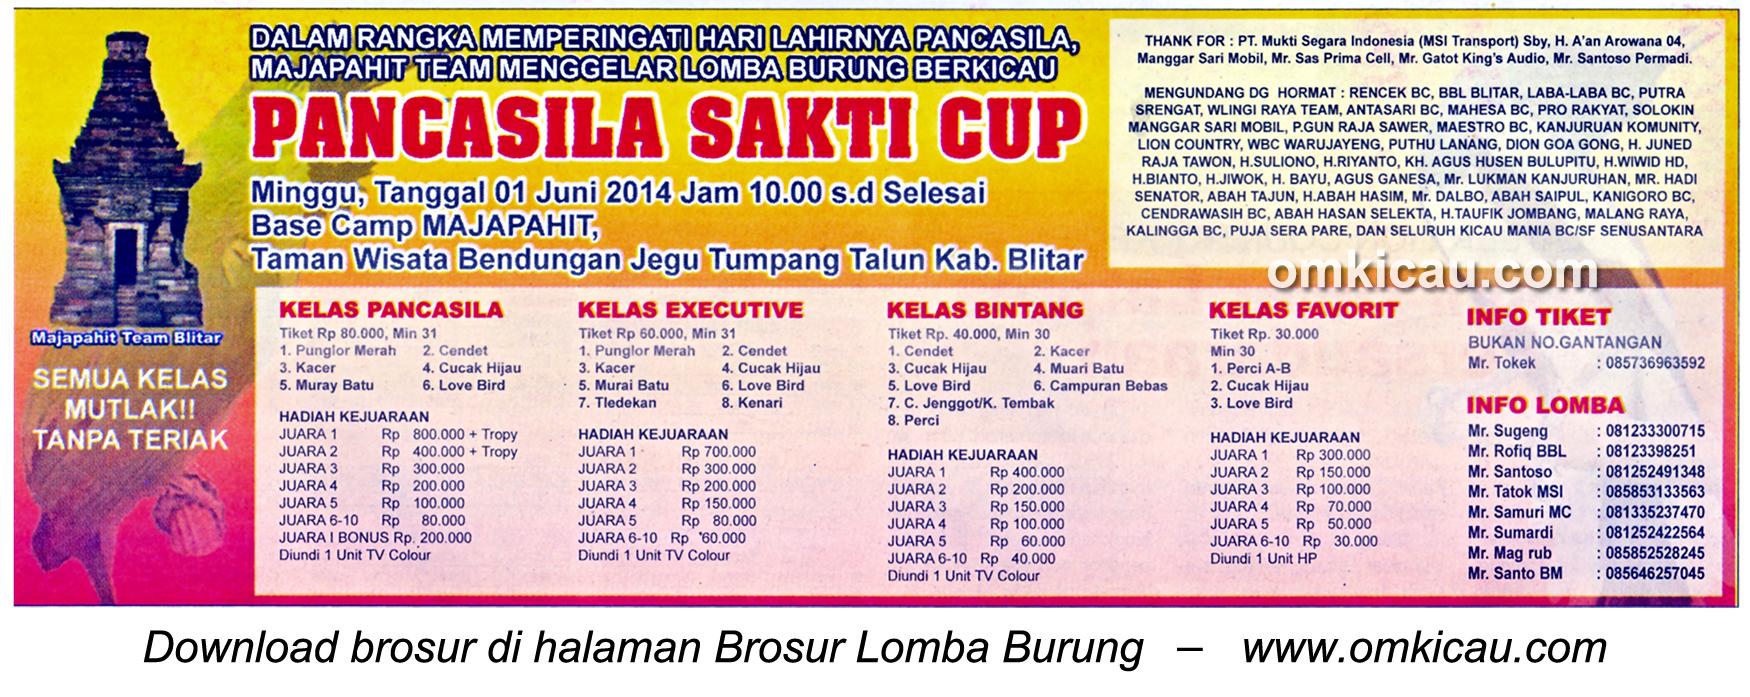 Brosur Lomba Burung Berkicau Pancasila Sakti Cup, Kab Blitar, 1 Juni 2014